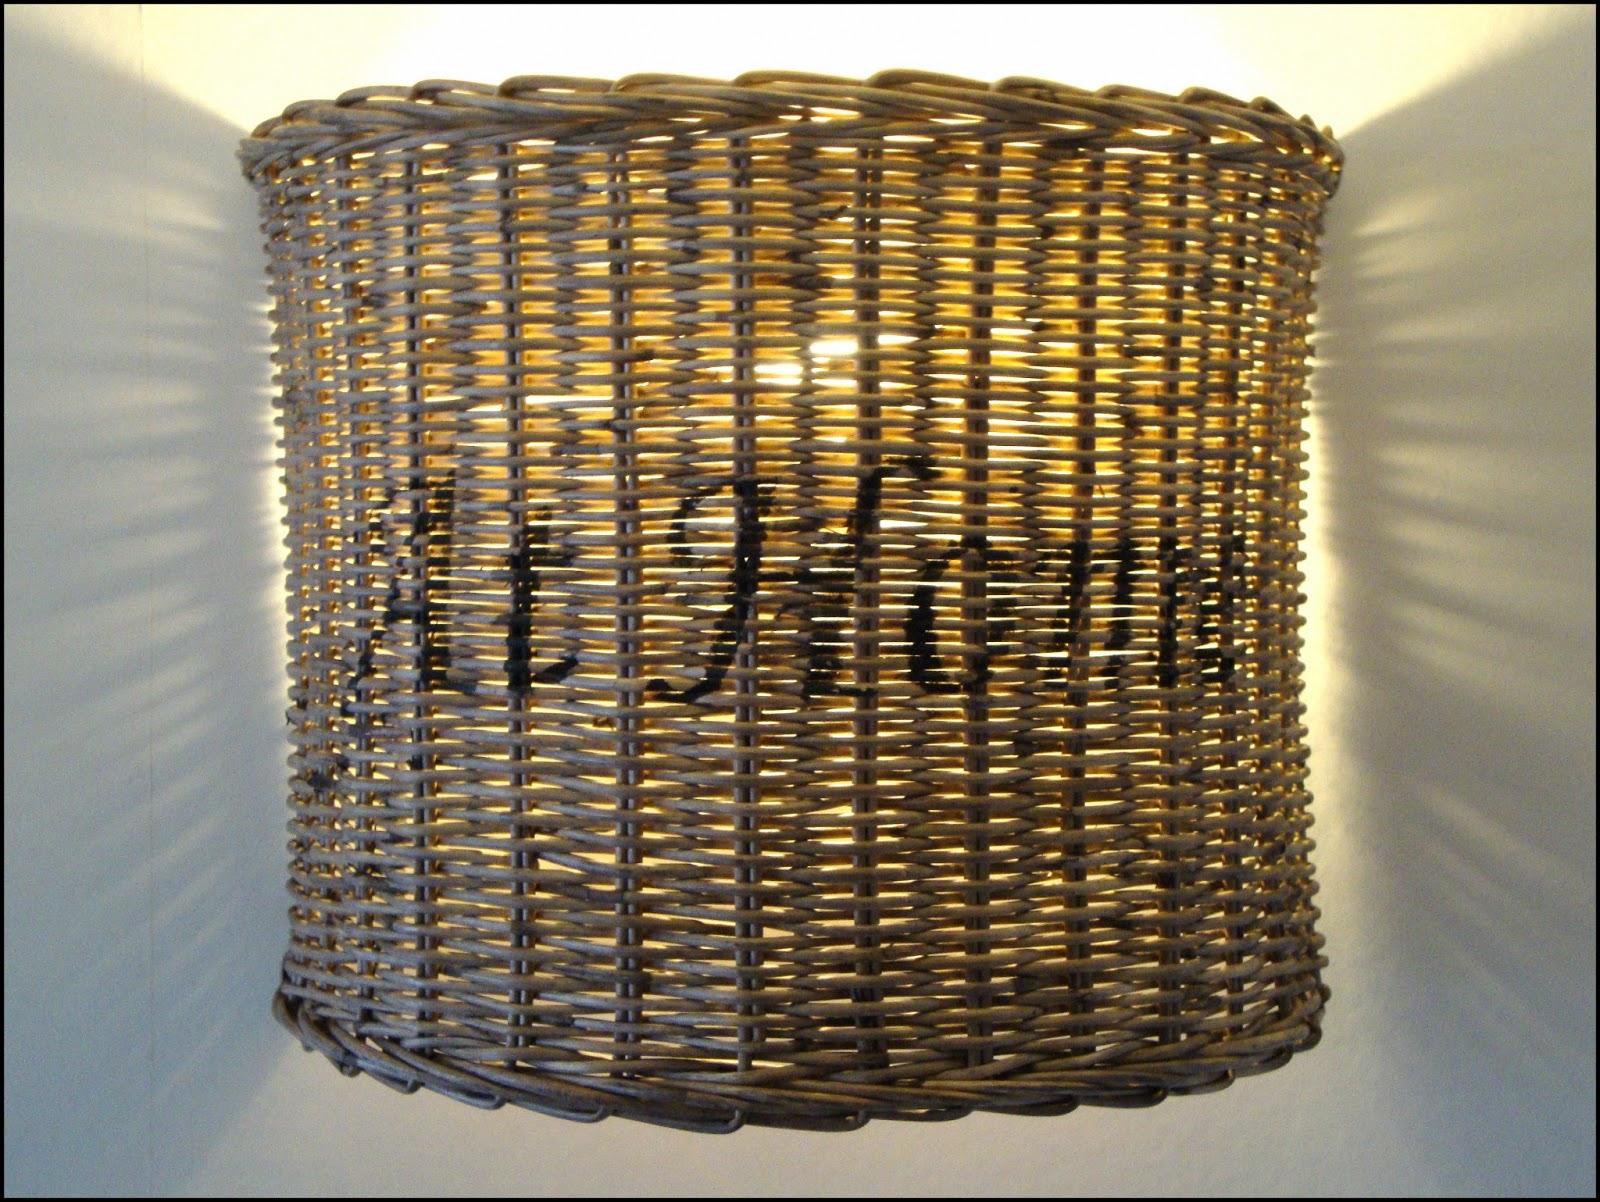 Wandverlichting Slaapkamer : Rieten wandlampje half rond